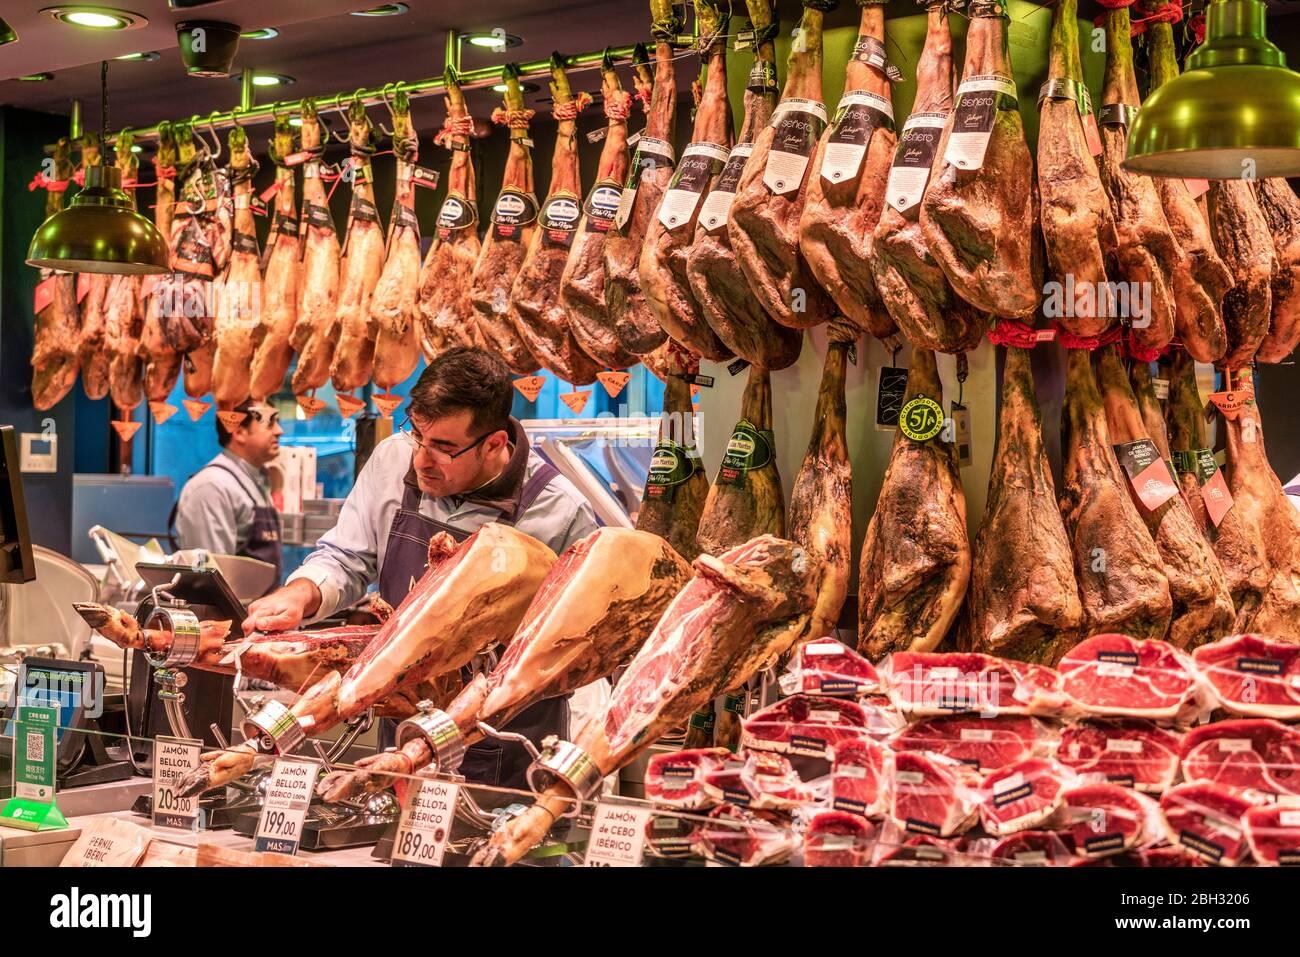 Mercat de la Boqueria, Man cutting Jamon Serrano, Ham stall, Market hall, Barcelona, Spain Stock Photo